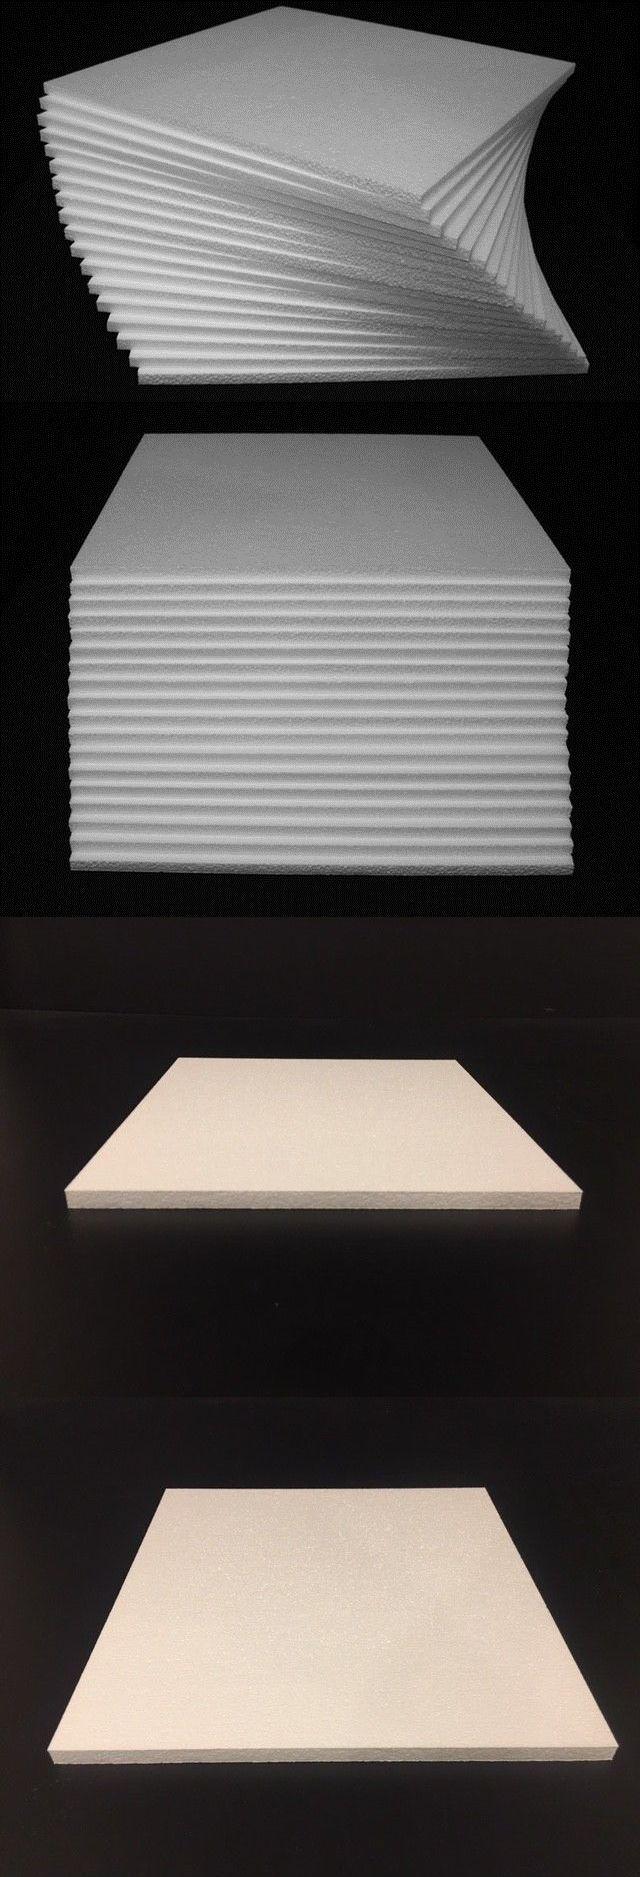 Foam Sheets 8434 24 Pcs 12 X 12 X 1 2 Styrofoam Polystyrene Flats Sheets New Buy It Now Only 22 95 On Ebay